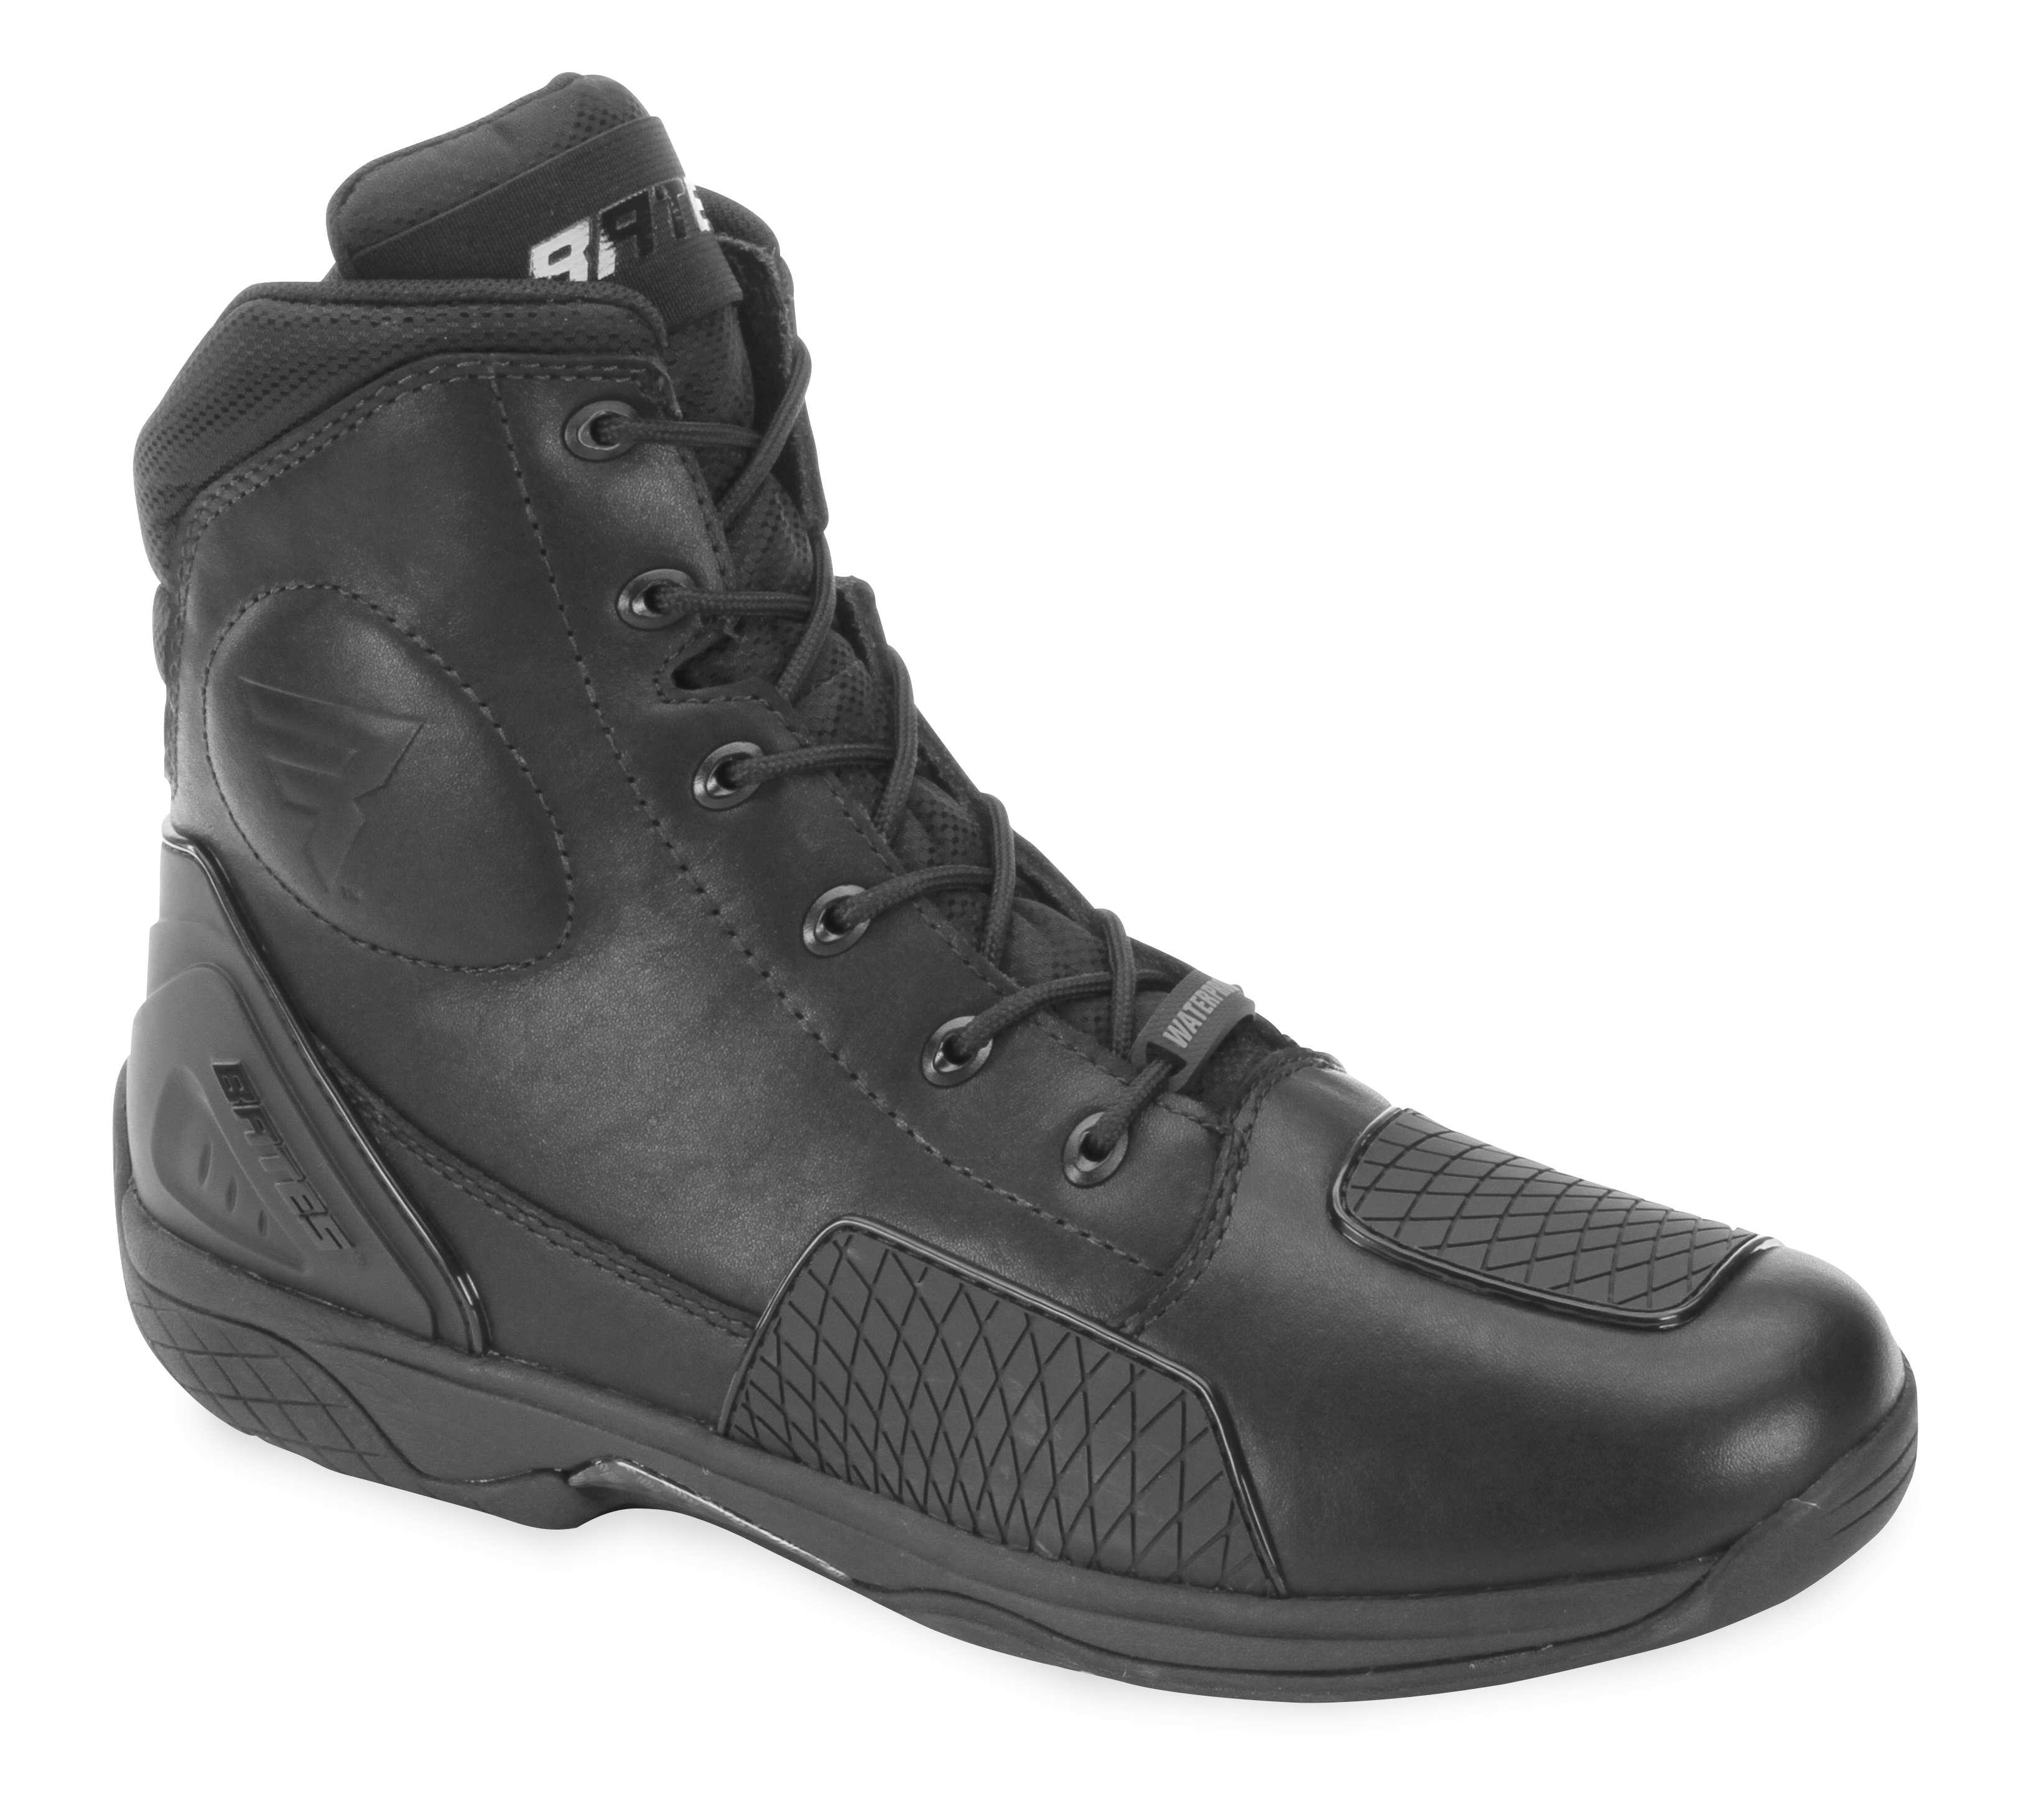 Adrenaline Boots